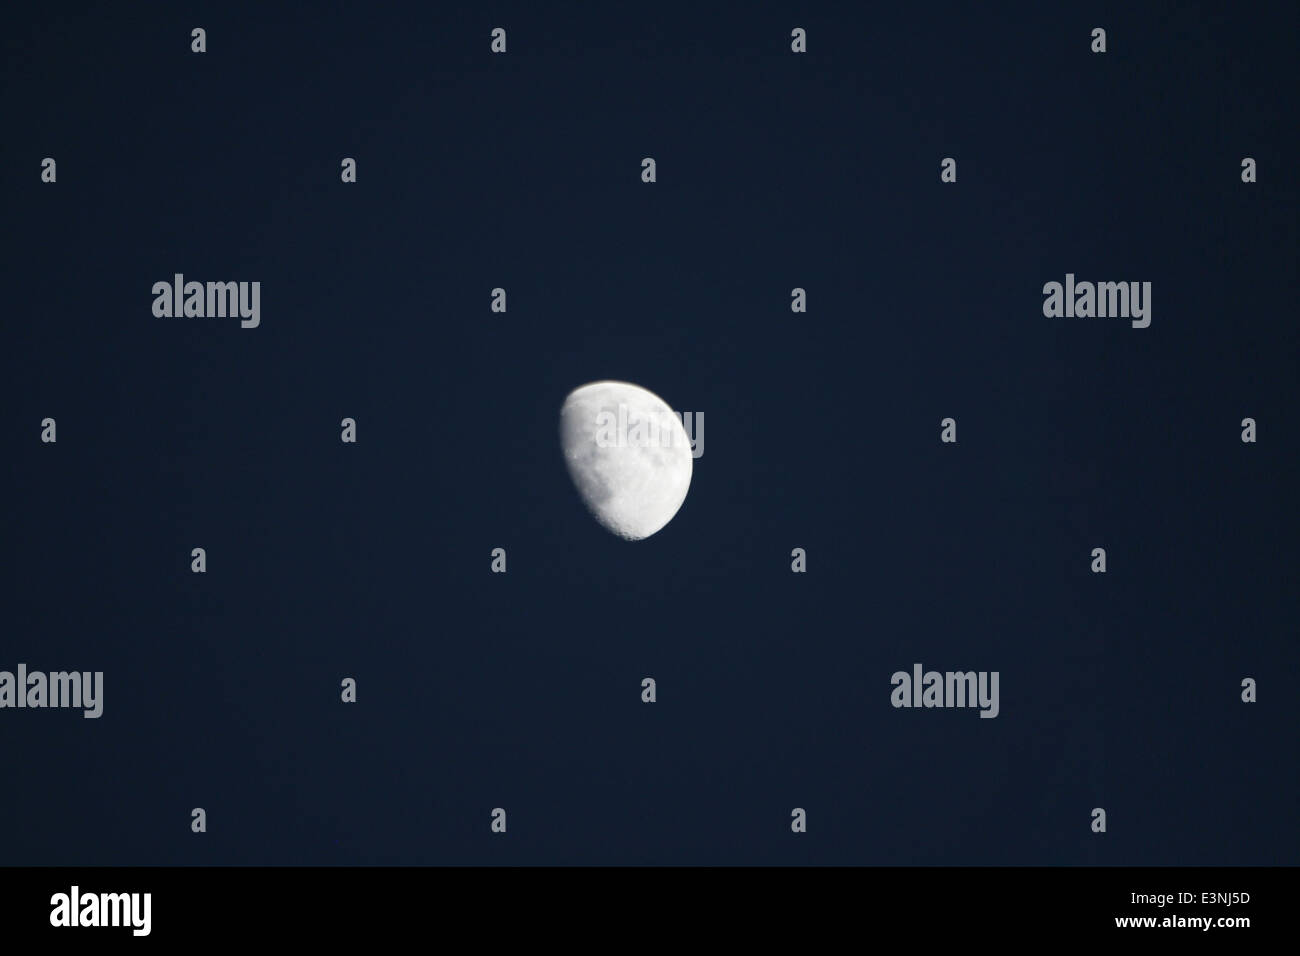 Mond bei Nacht - Stock Image